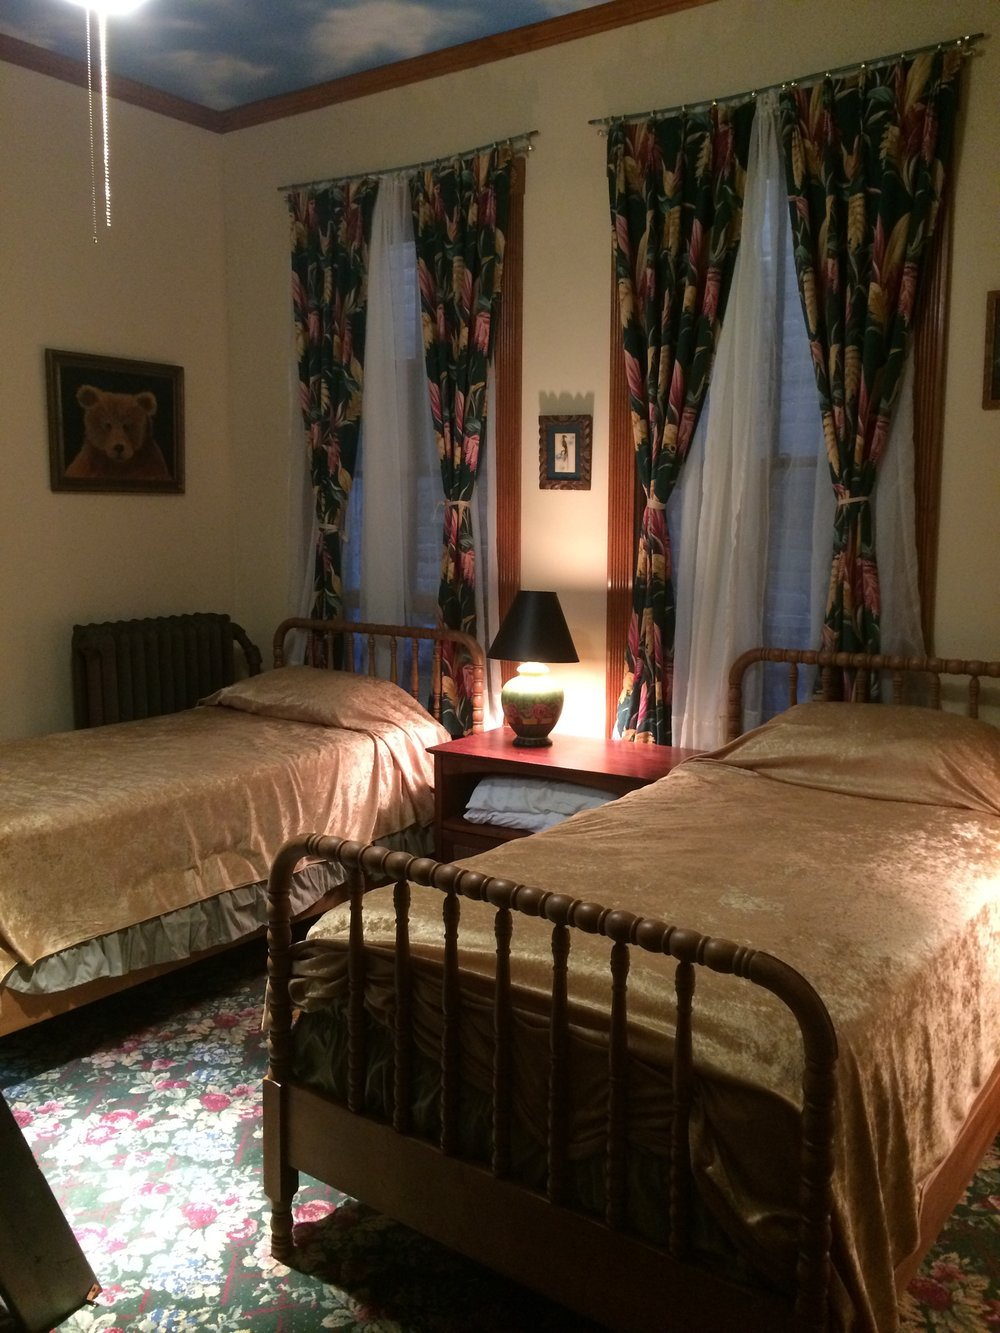 photo #2 - 3 twin bedroom